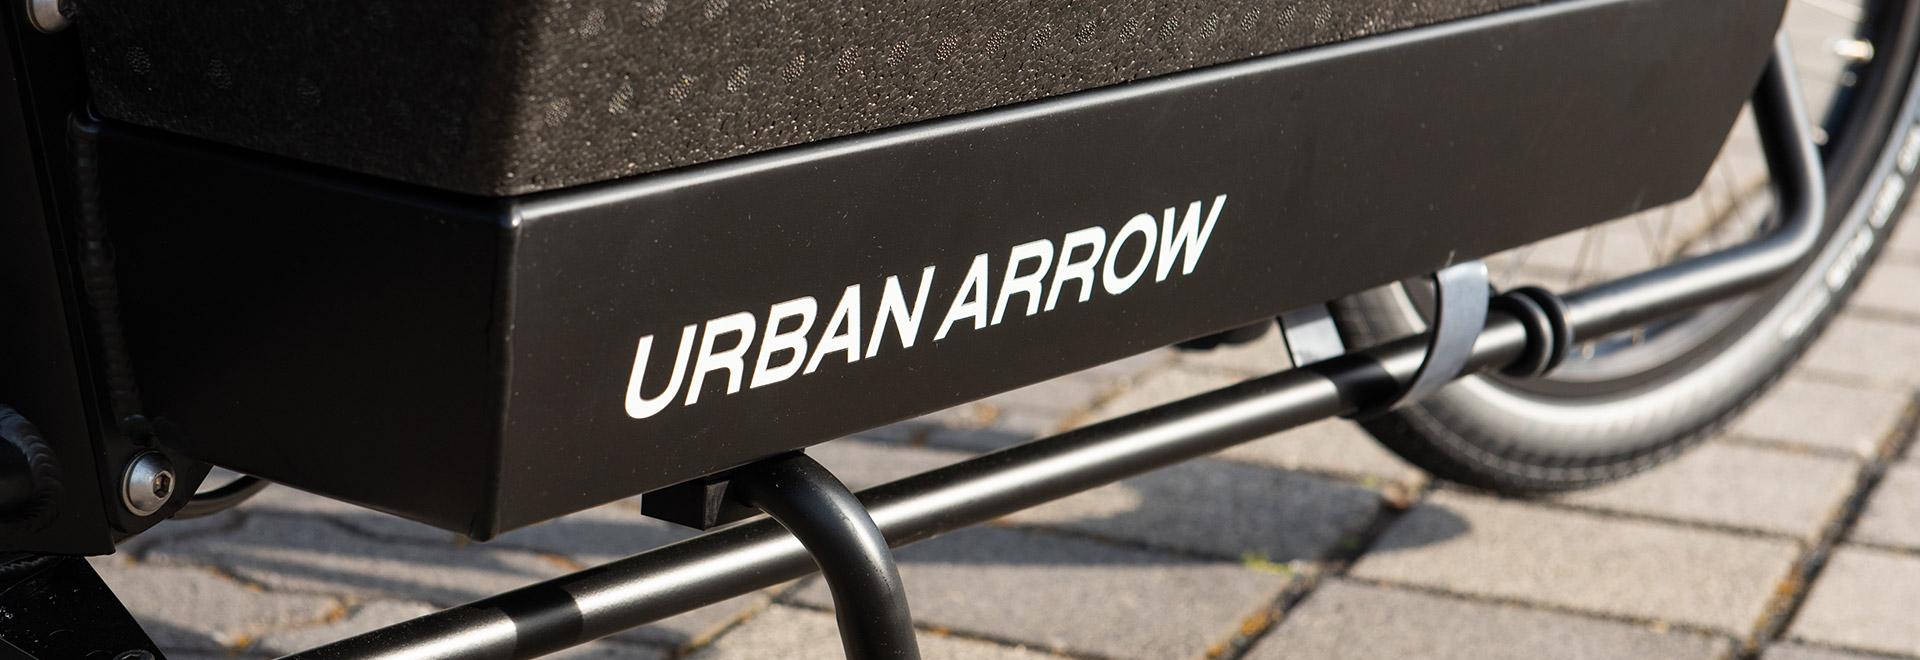 Urban Arrow Family – Kindertransport mit neuer Freiheit